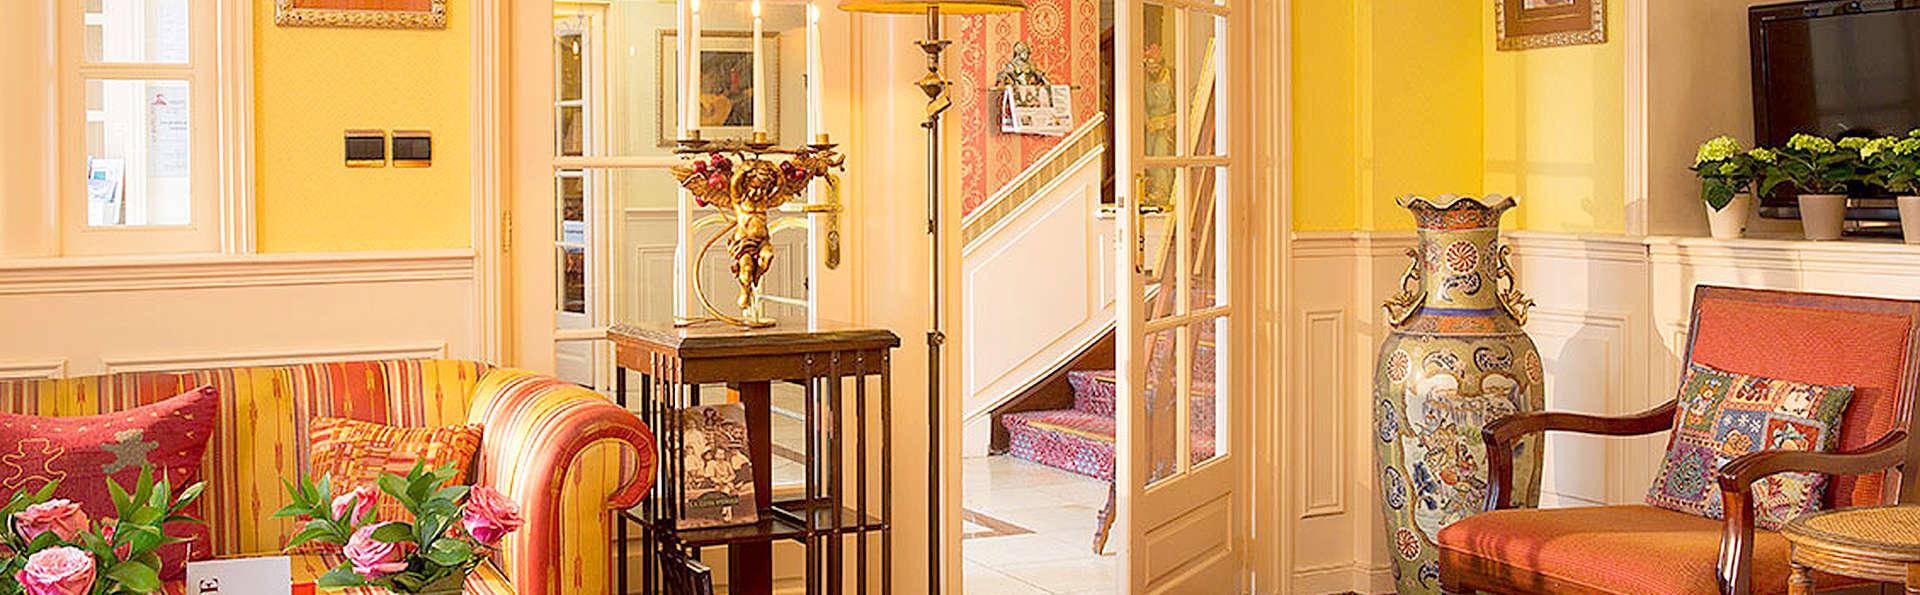 Hôtel La Matelote - EDIT_Lounge.jpg